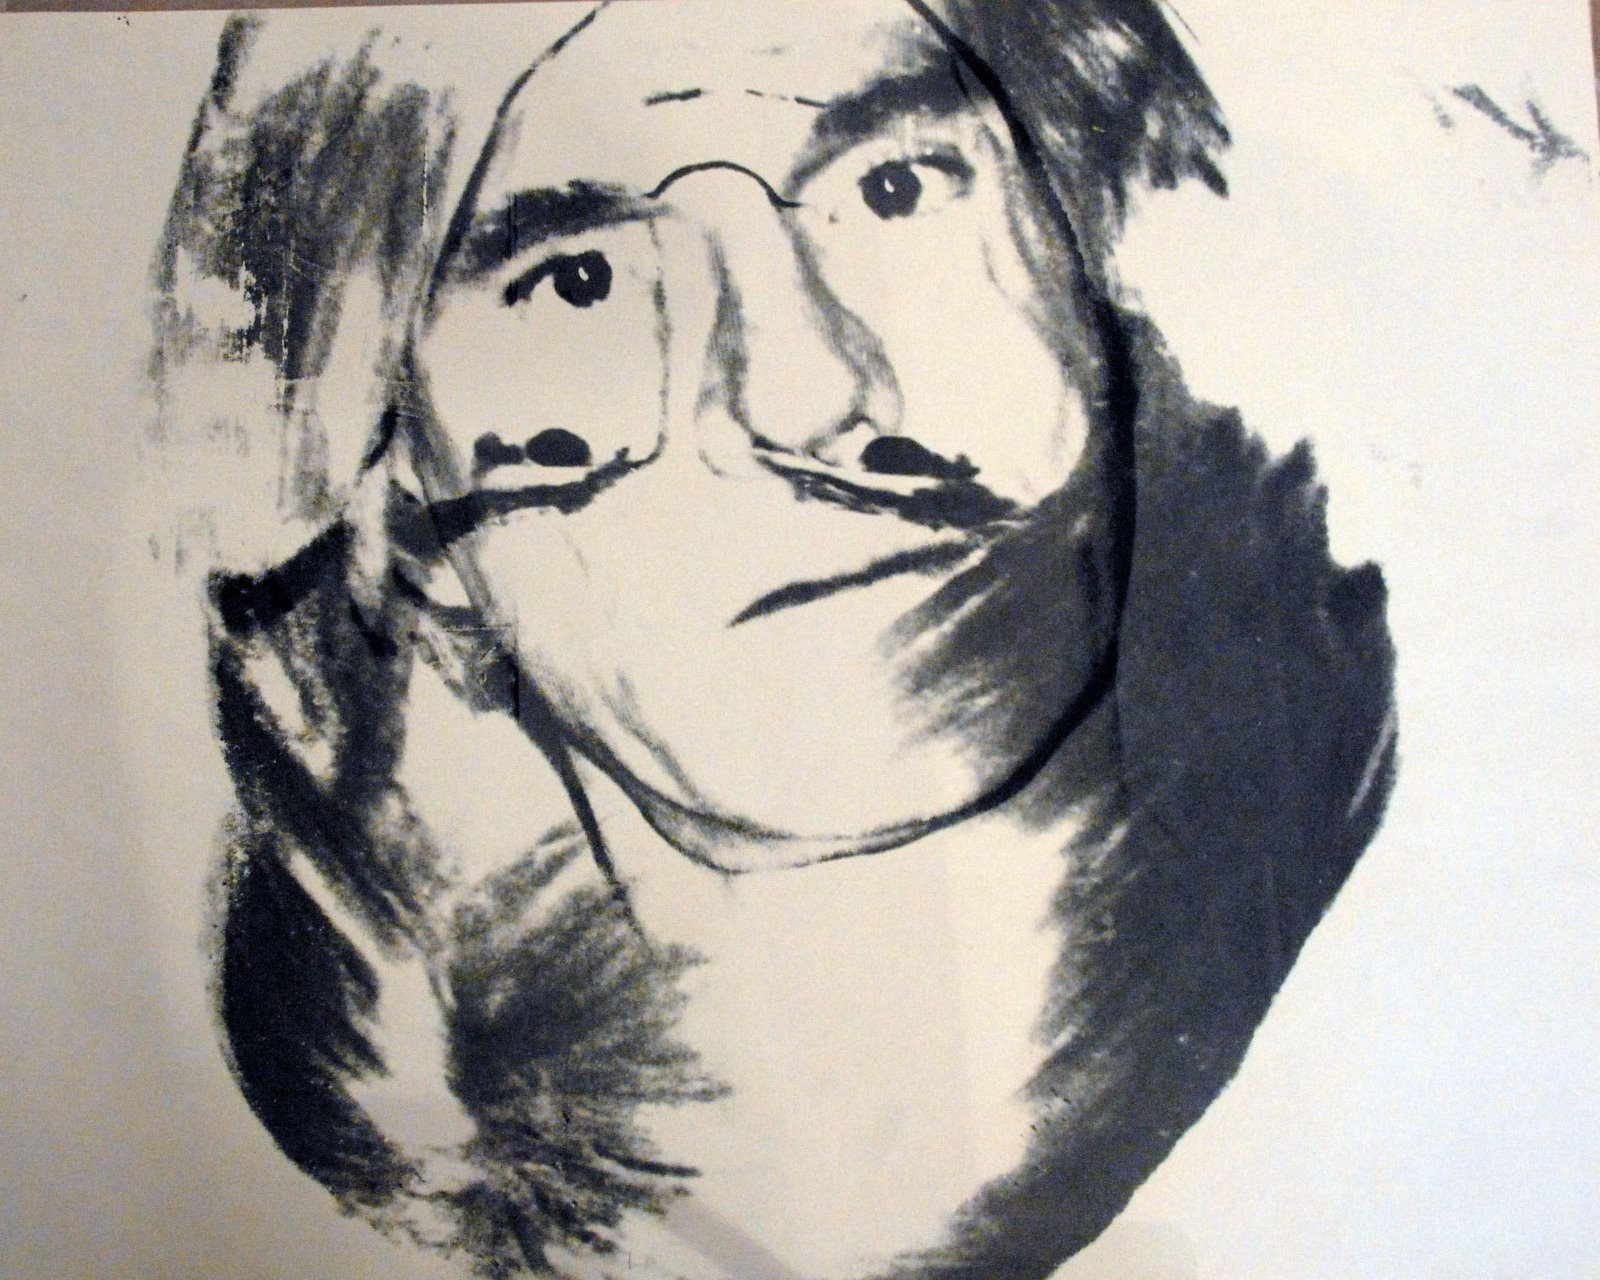 [warhol-self-portrait.jpg]